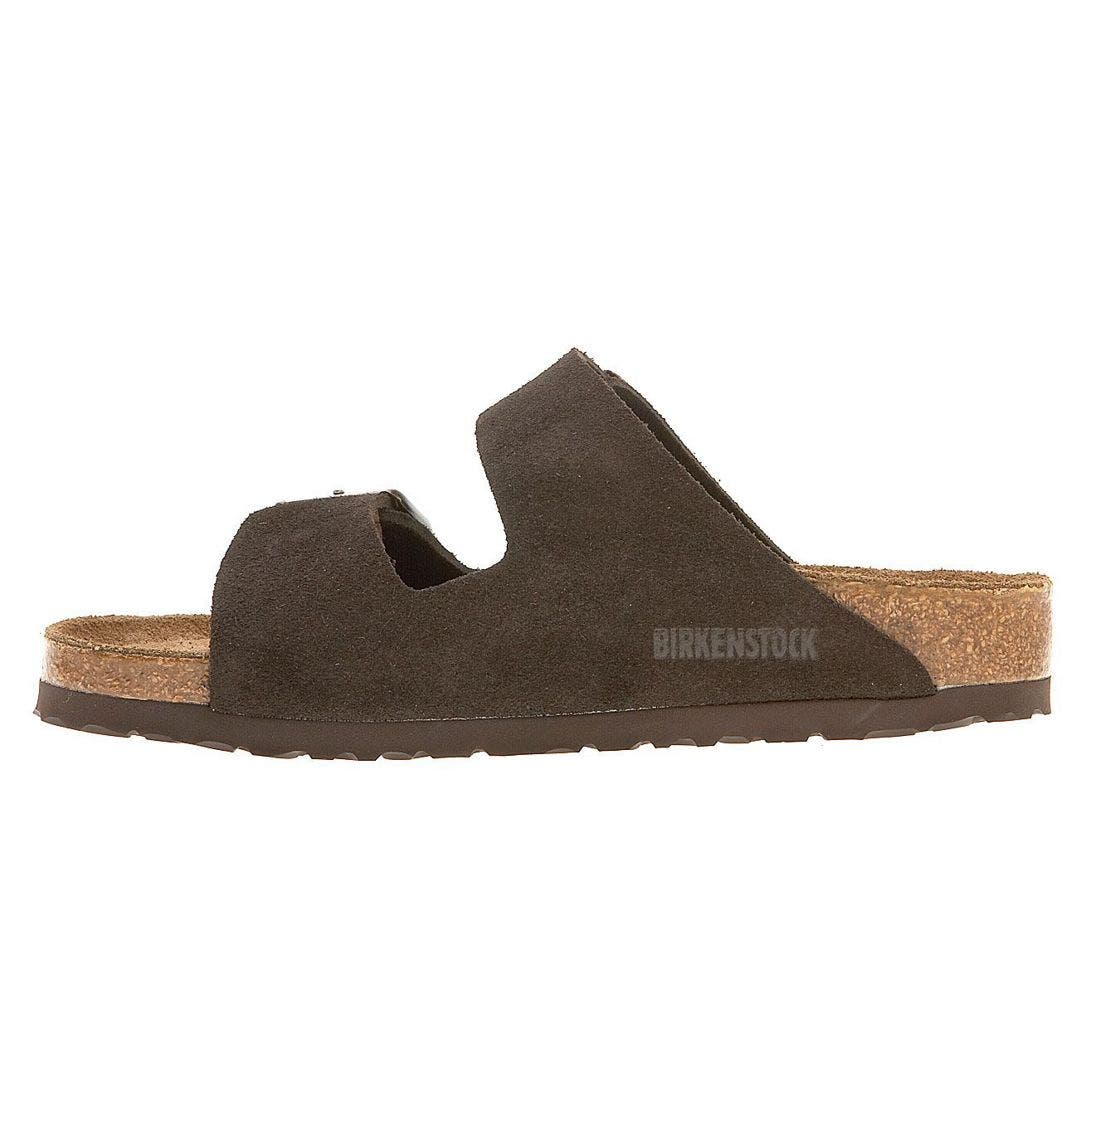 Alternate Image 2  - Birkenstock 'Arizona' Soft Footbed Suede Sandal (Women)